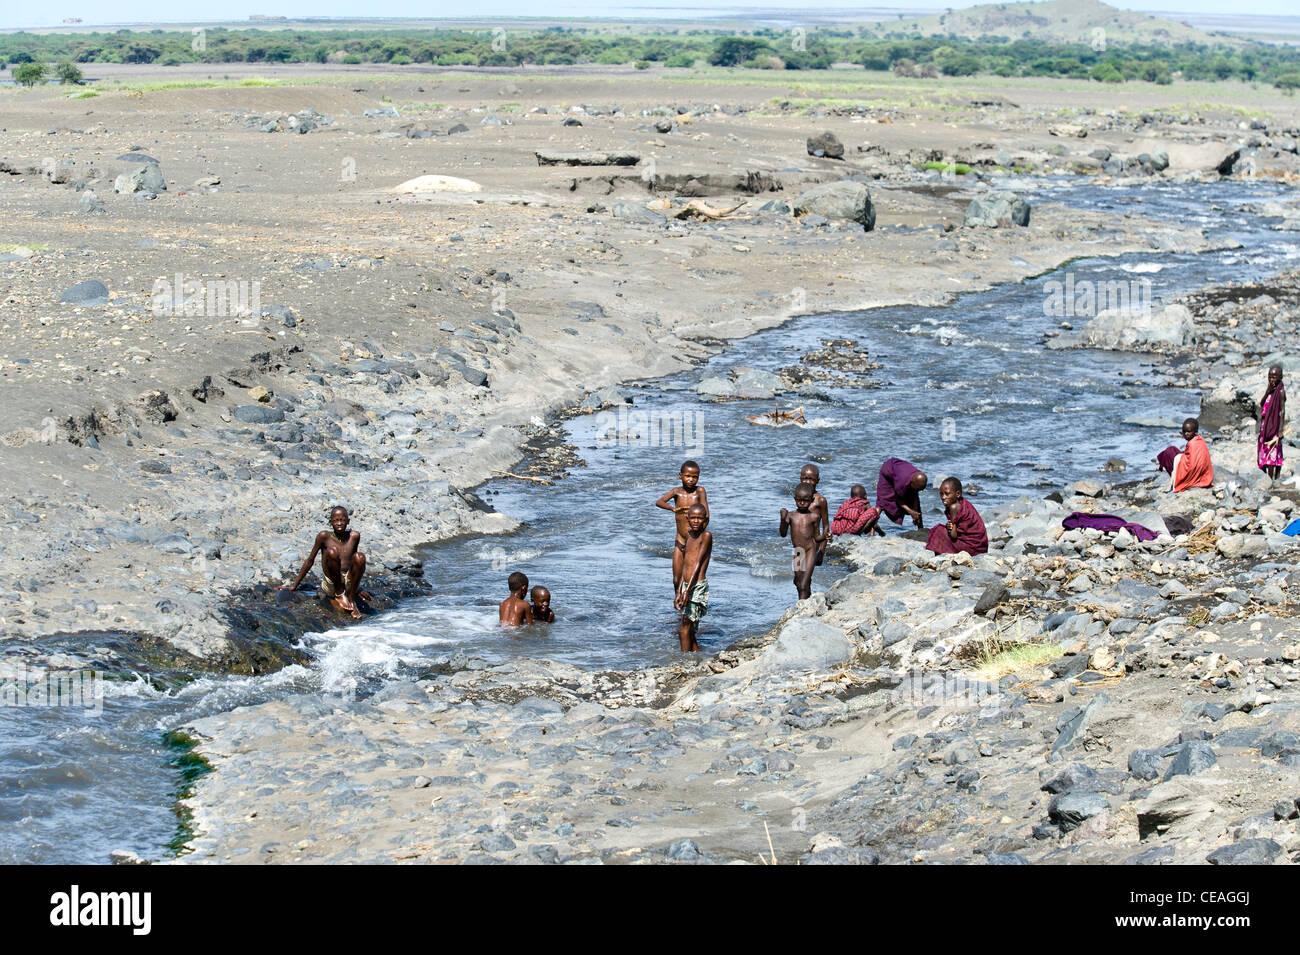 Maasai children bathing in a river at Engaresero in northern Tanzania - Stock Image